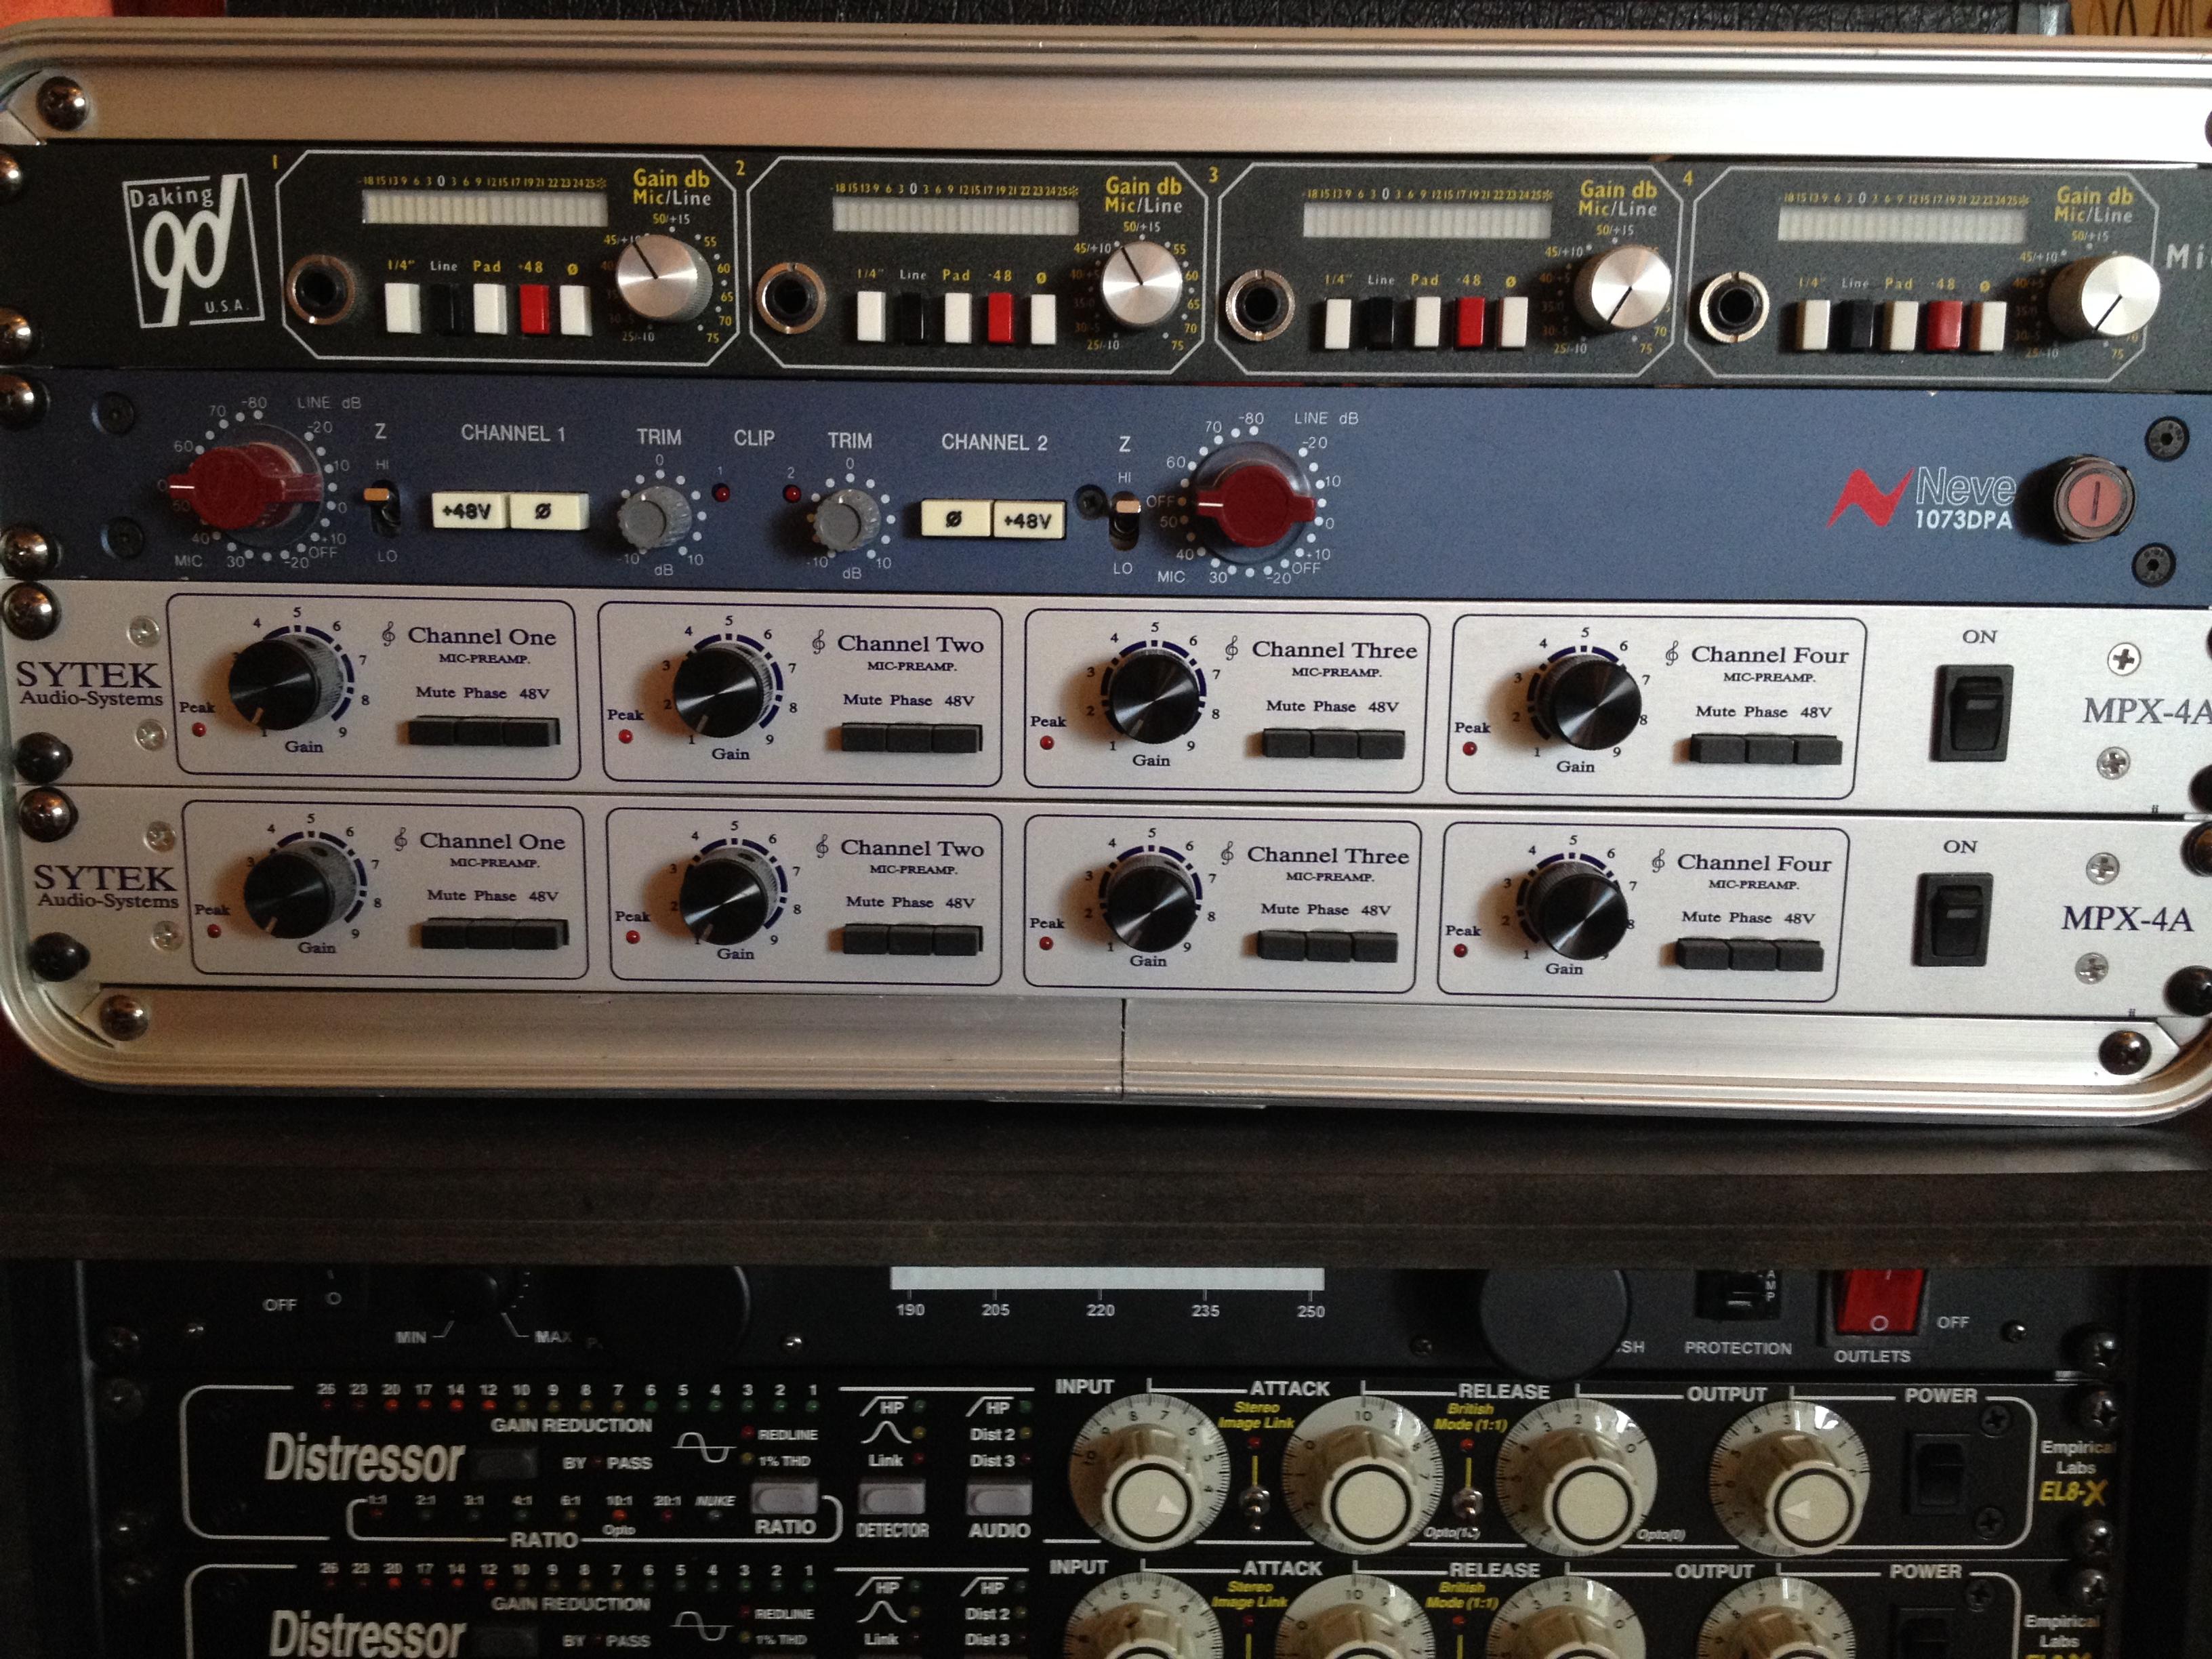 sytek audio systems mpx 4aii